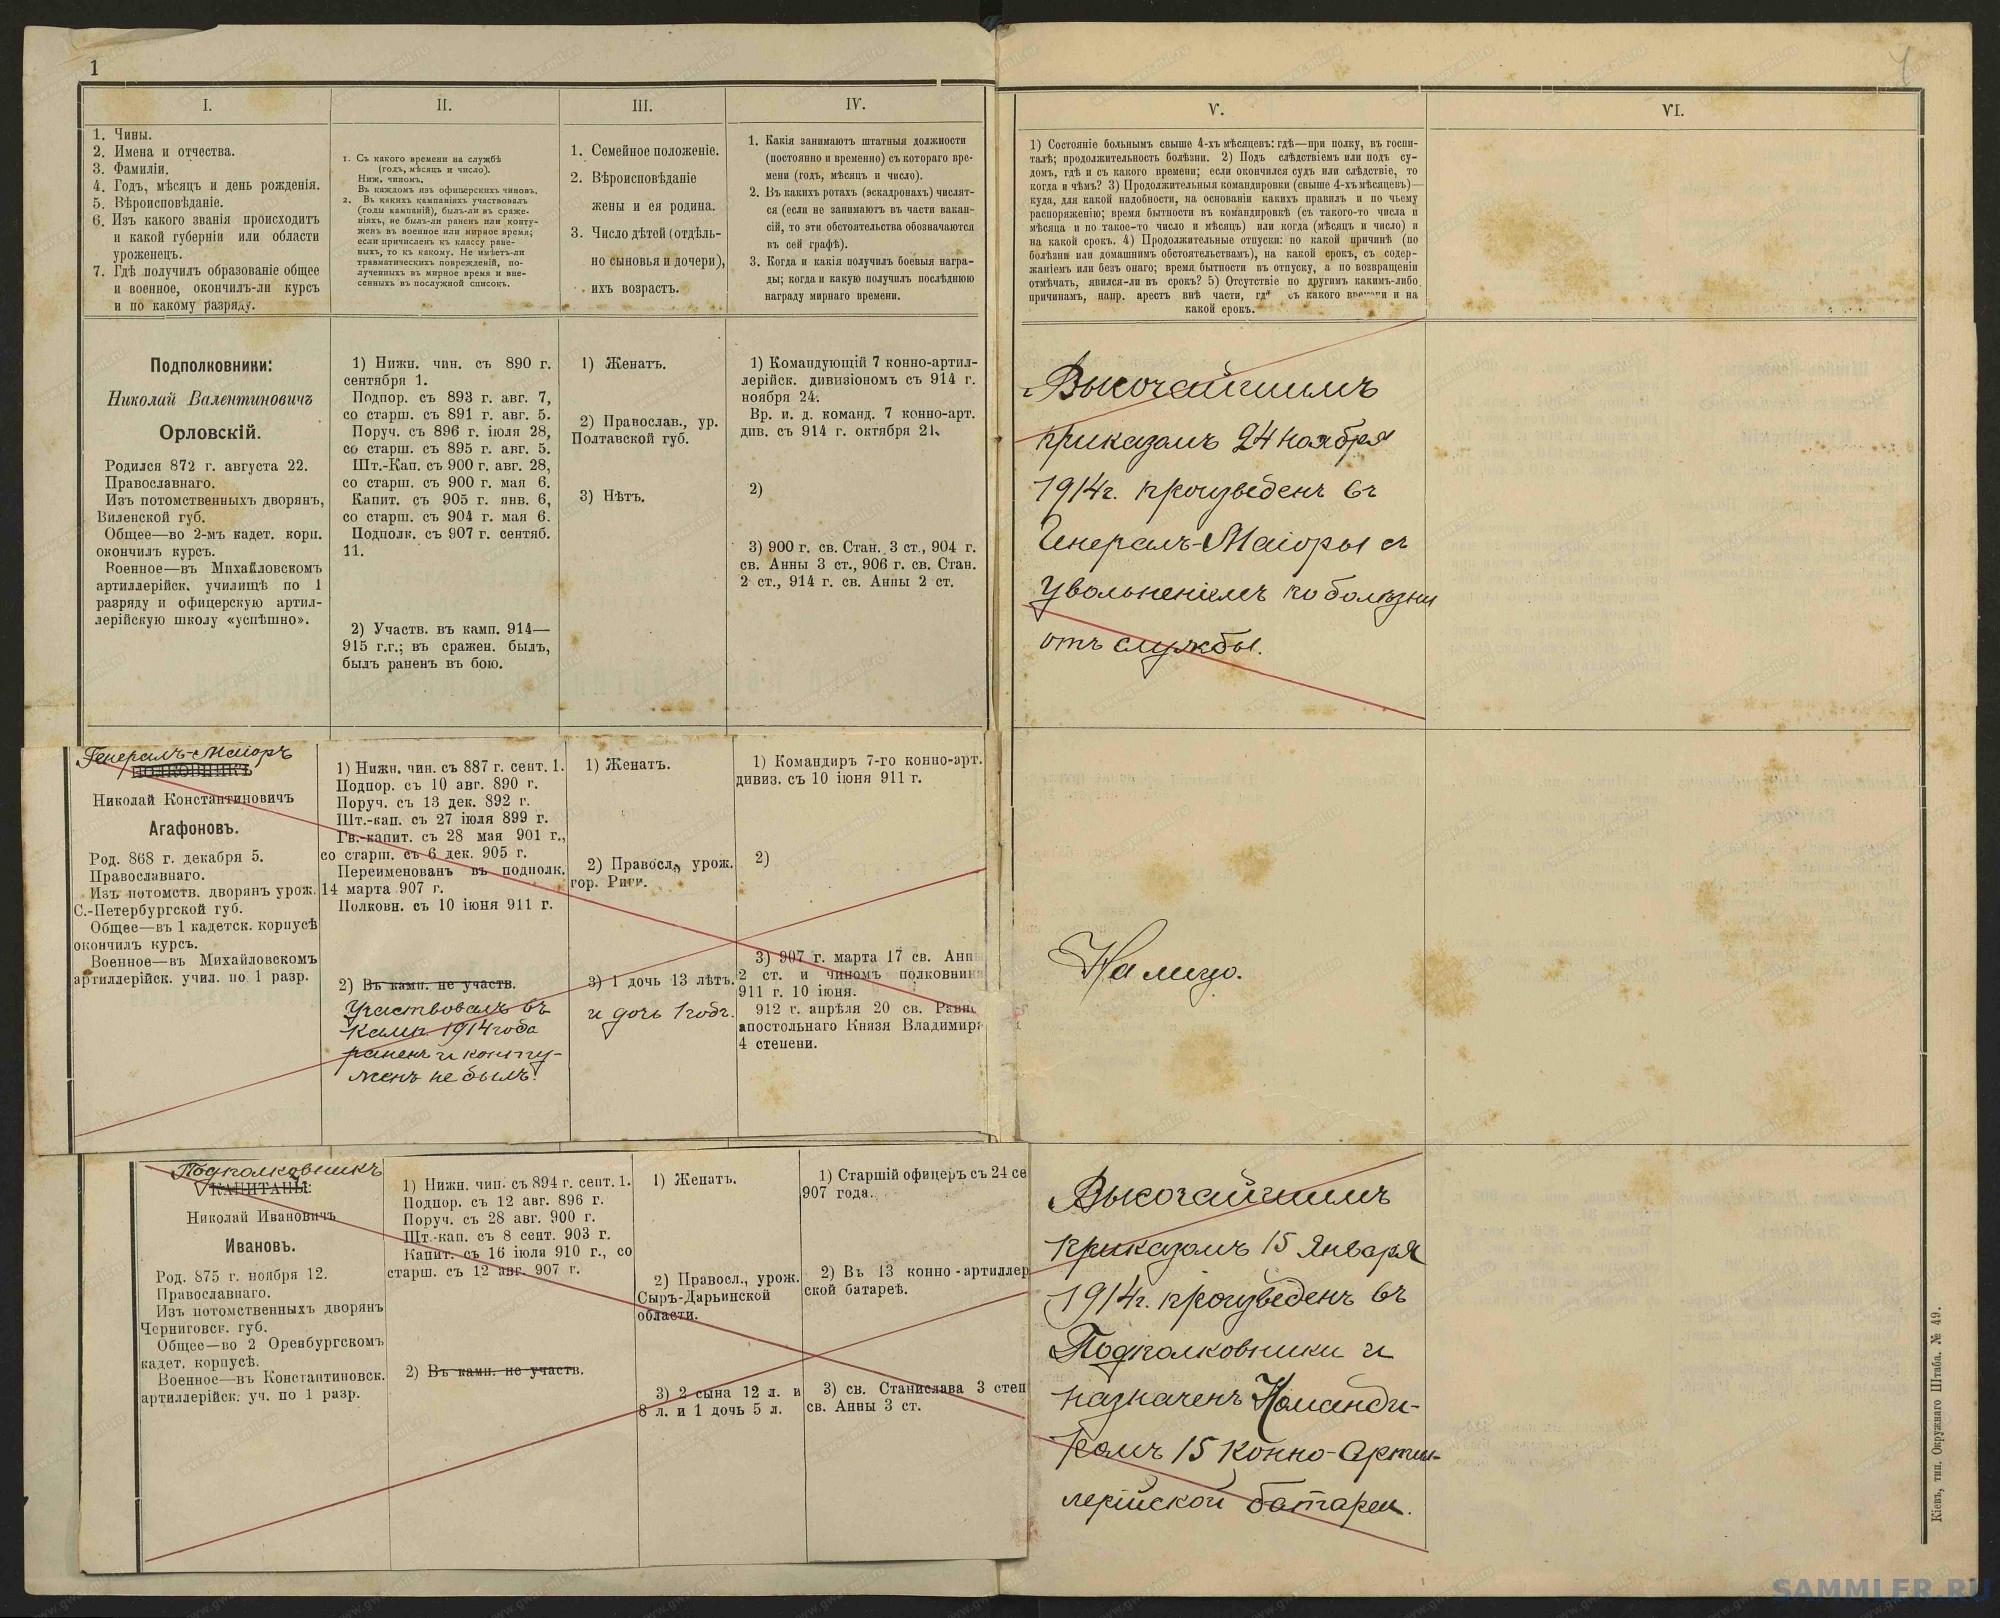 Список офицеров 7-го конно-артиллерийского дивизиона на 01.01.1915__03_.jpg